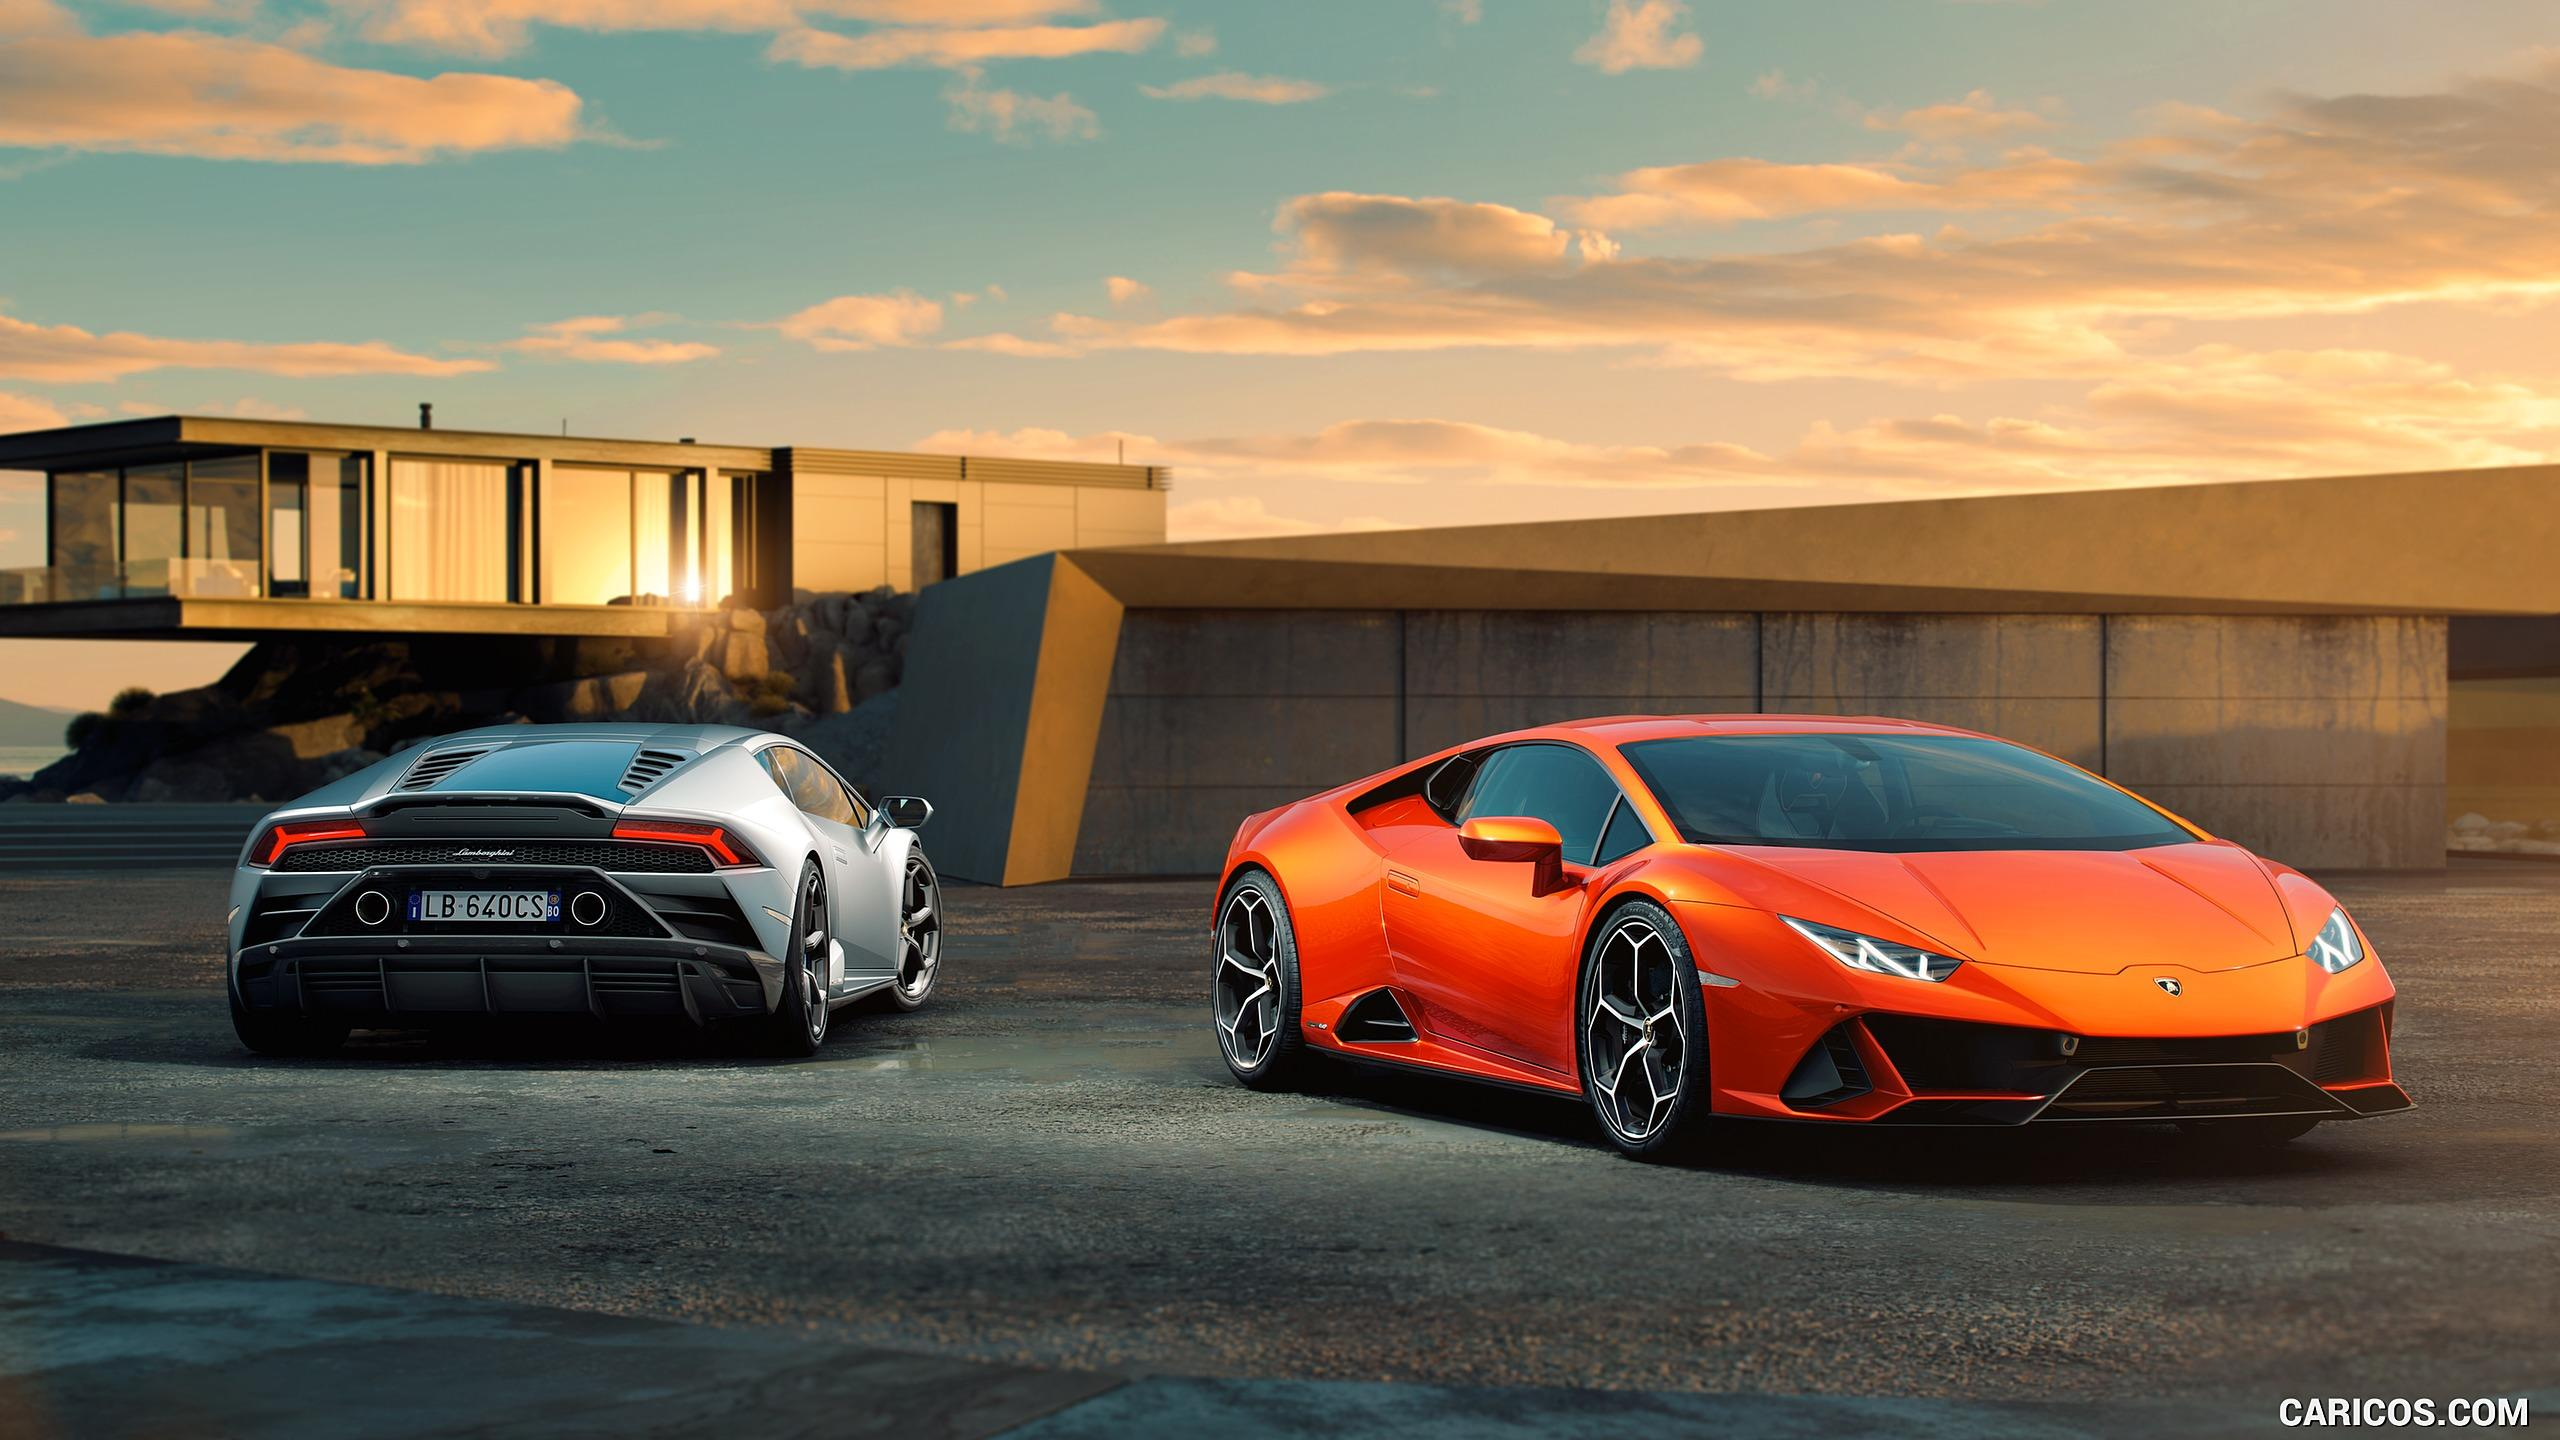 Lamborghini Huracán EVO Wallpapers , Wallpaper Cave